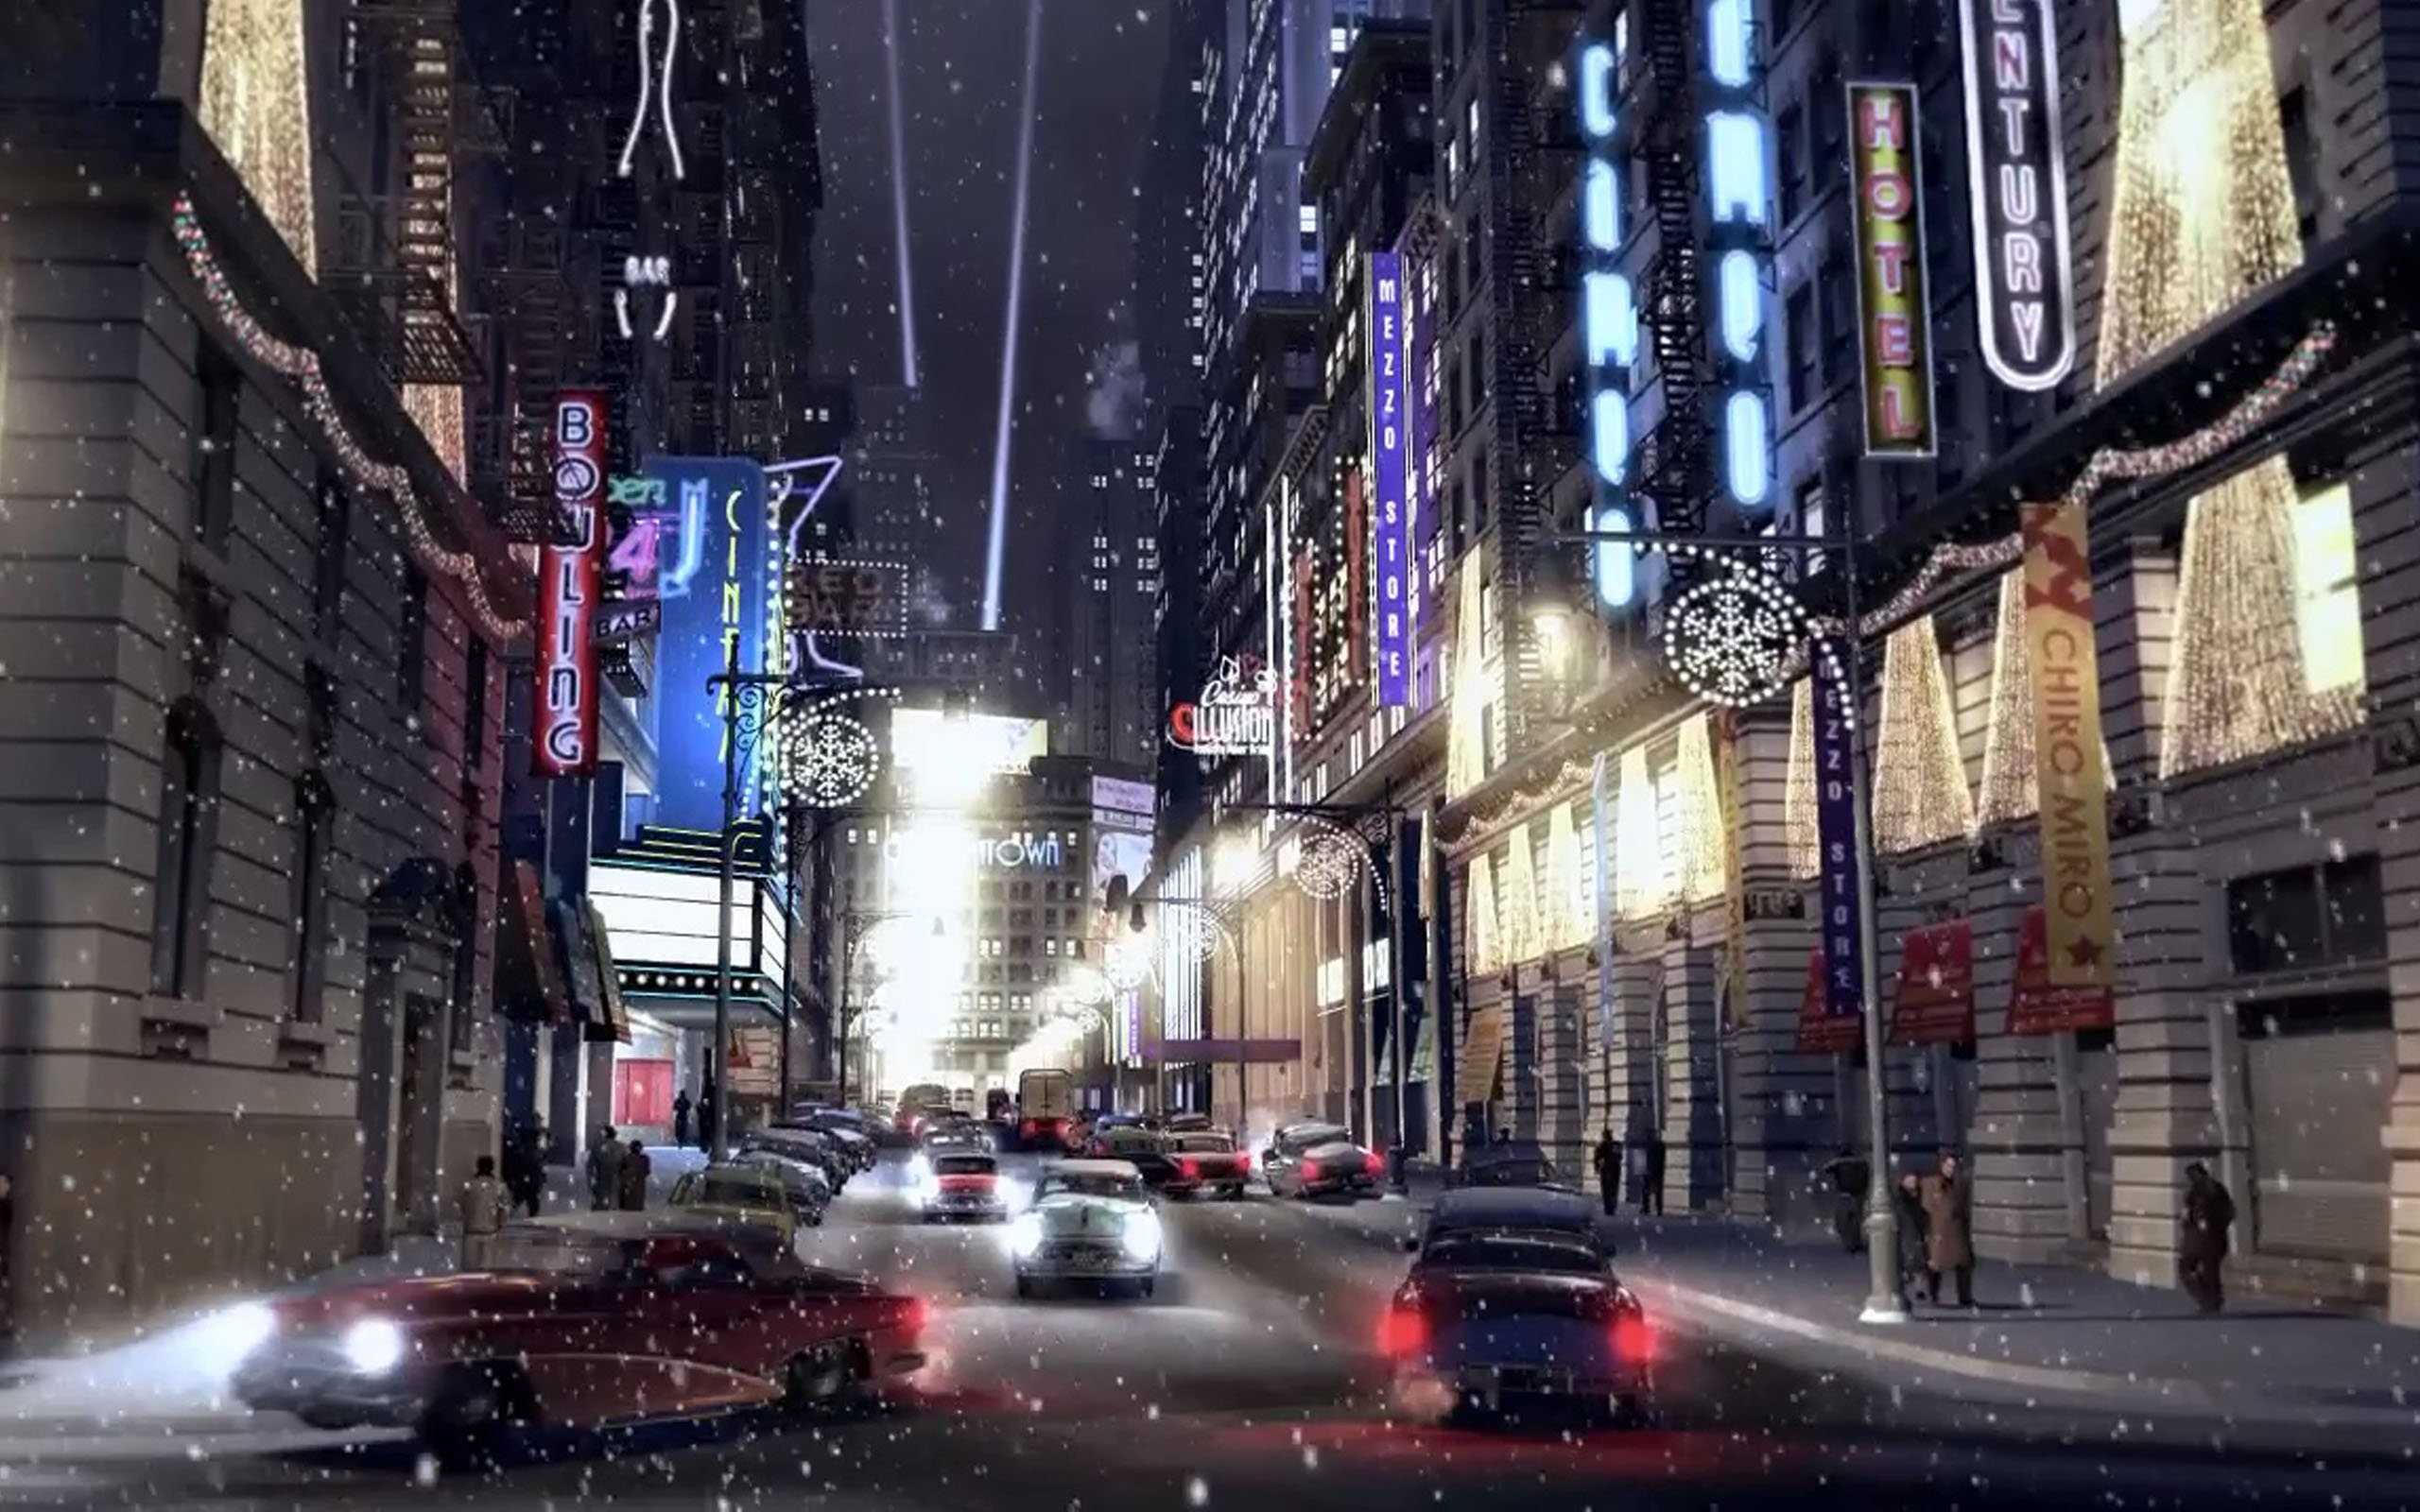 Mafia III Game HD wallpaper | Desktop Wallpapers | Pinterest | Mafia and Hd  wallpaper